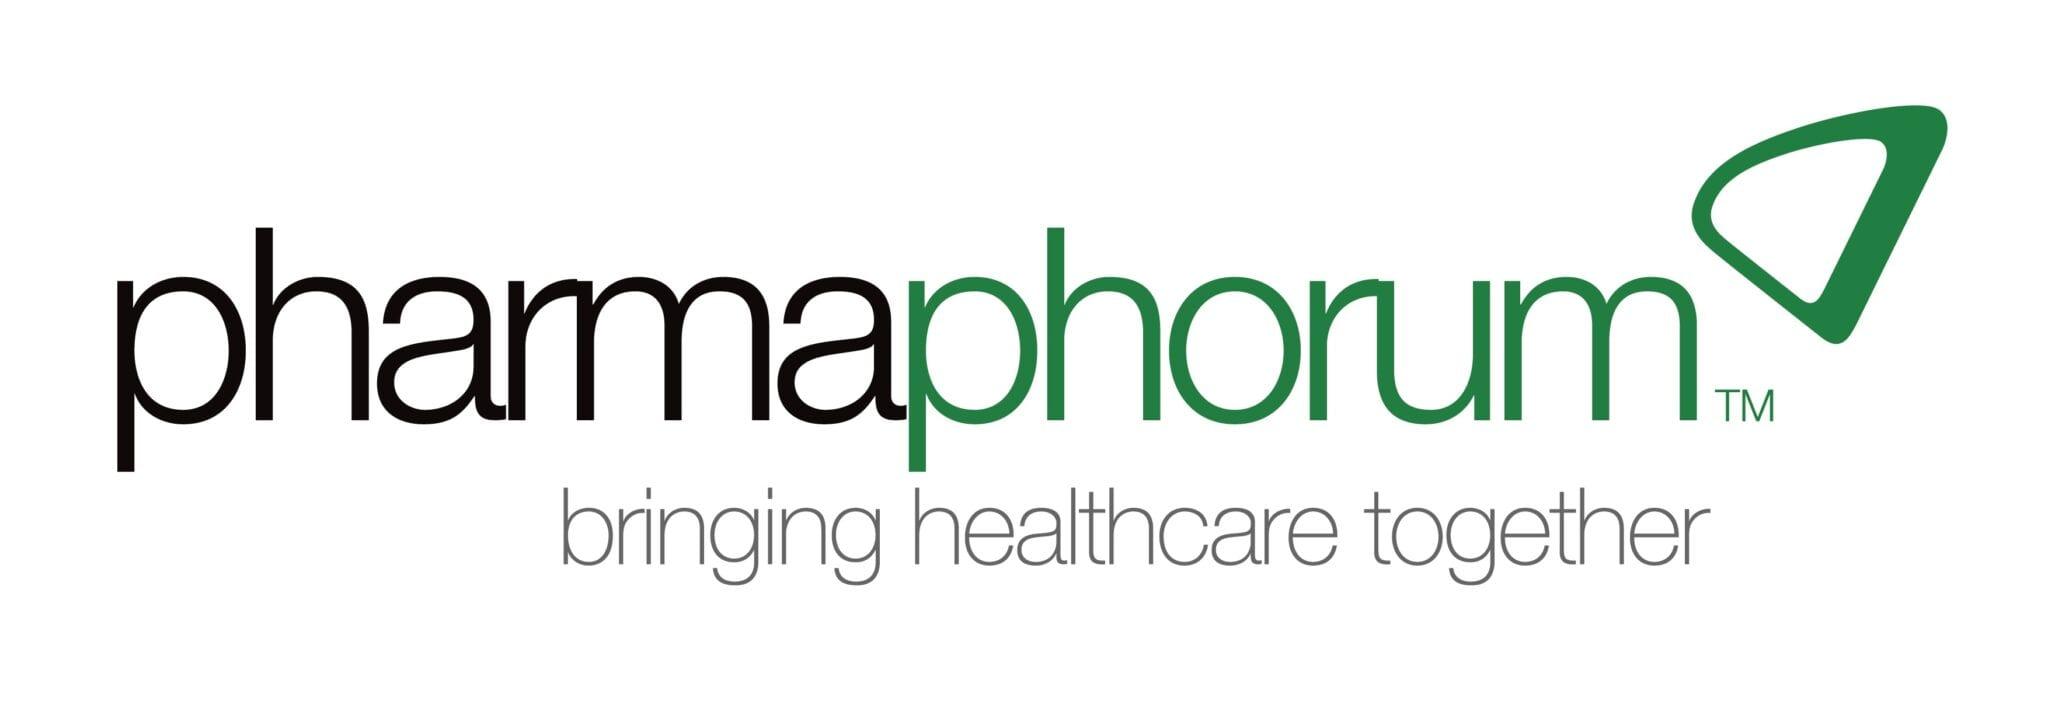 inflammasome therapeutics - pharmaphorum media partner